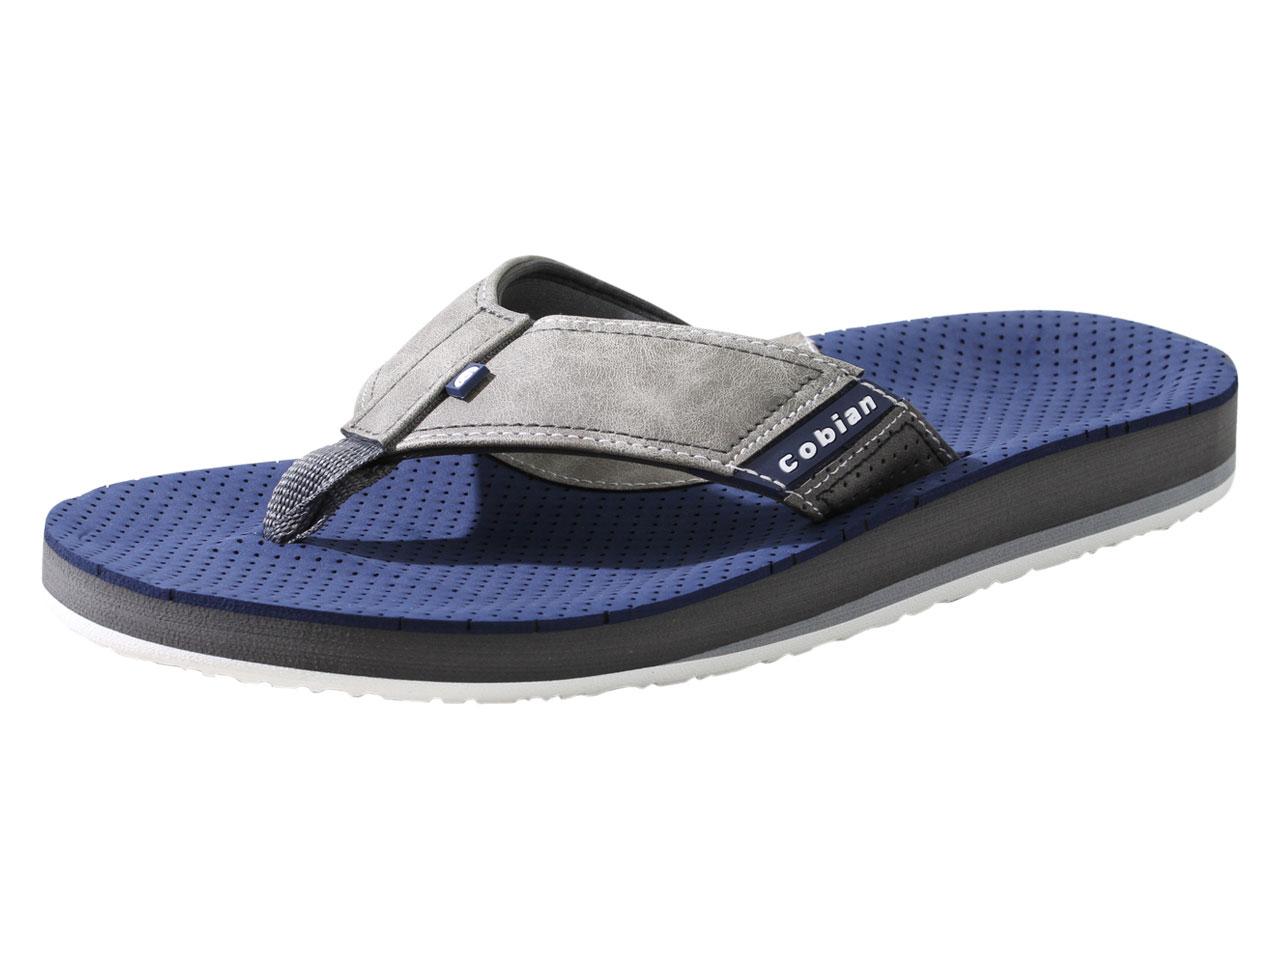 984359e4e73f Cobian mens a ii flip flops sandals shoes ebay jpg 1280x960 Cobian flip  flops